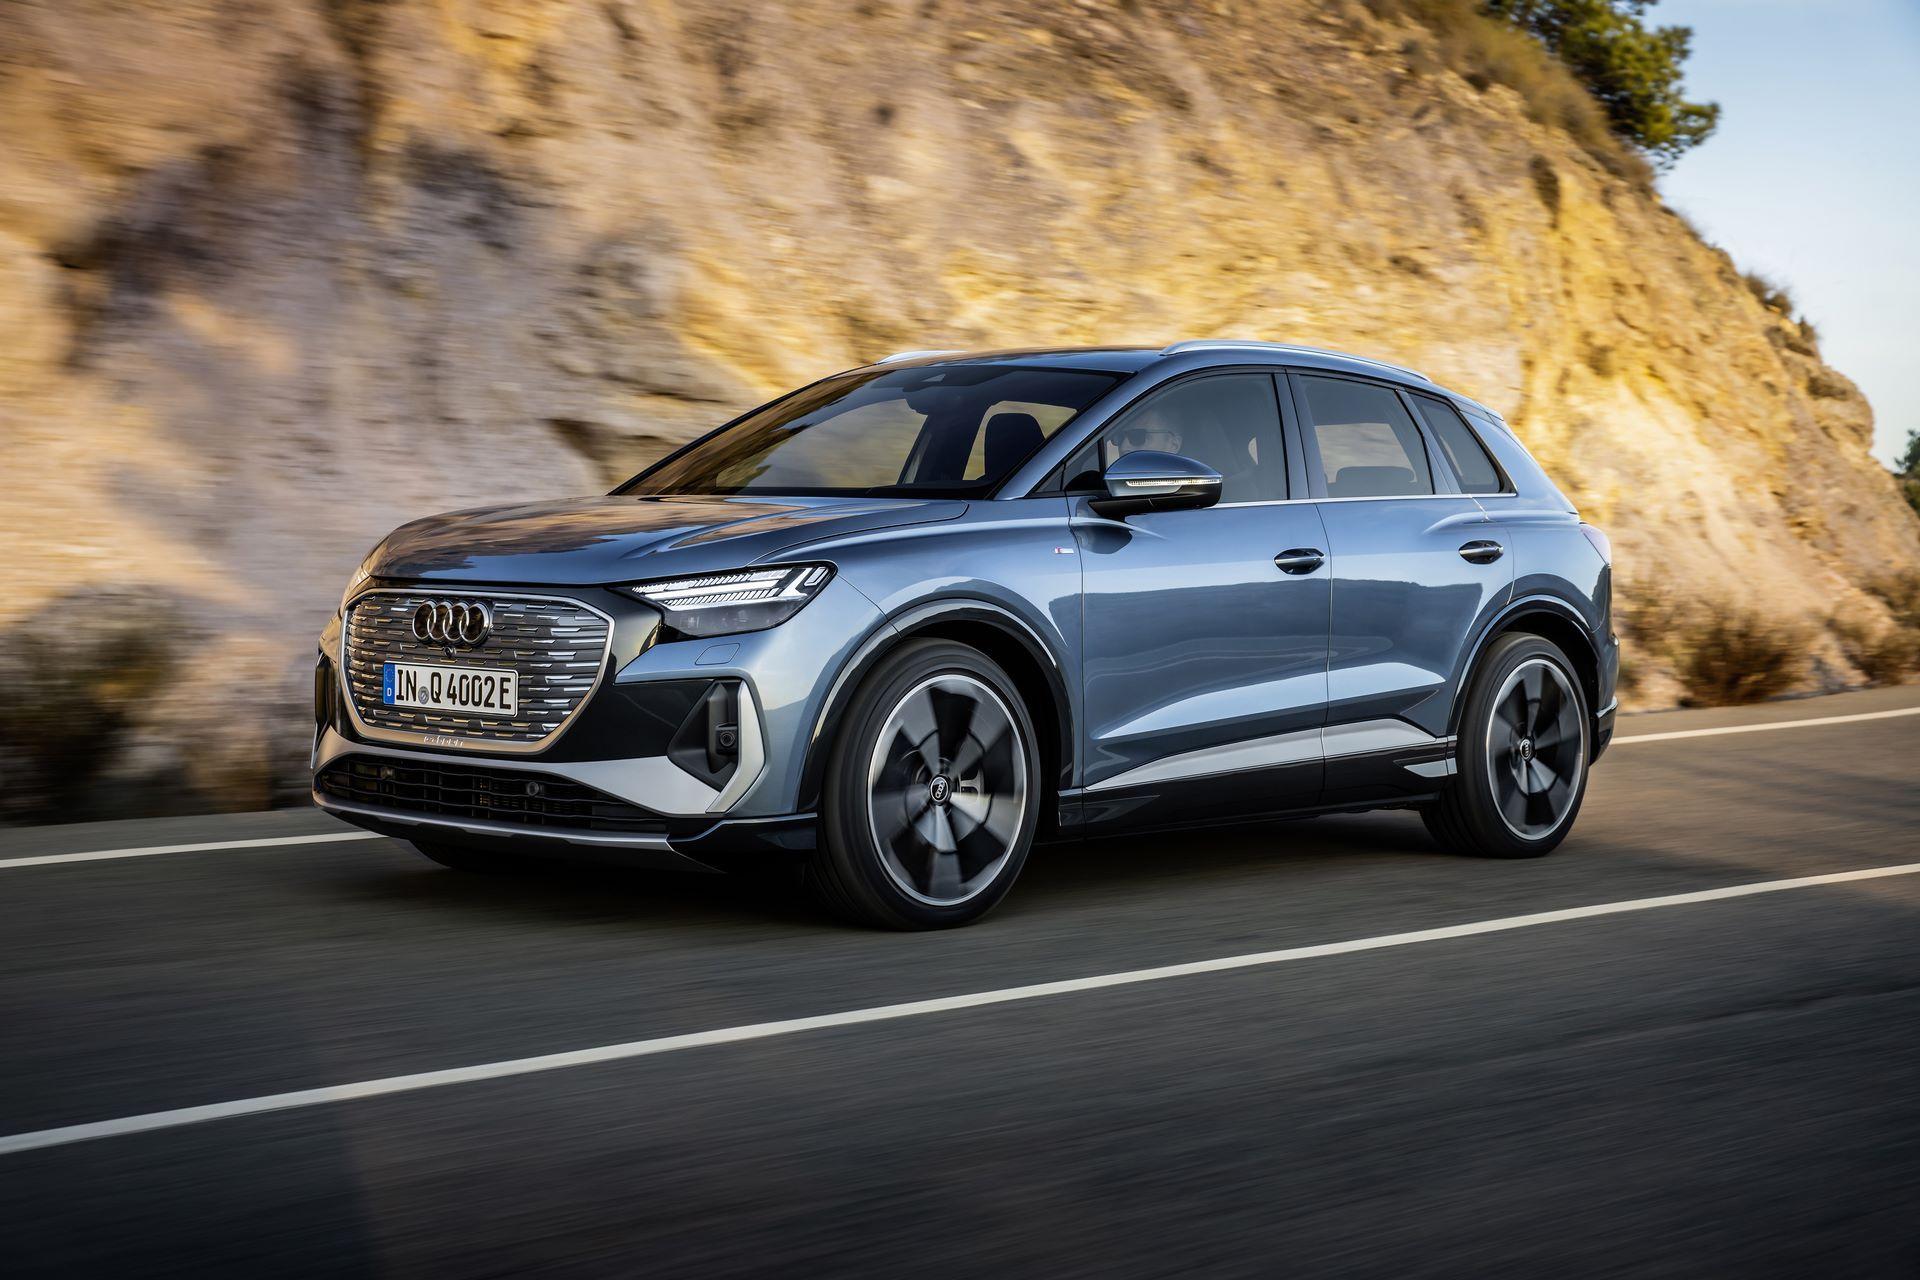 Audi-Q4-e-tron-and-Q4-e-tron-Sportback-56